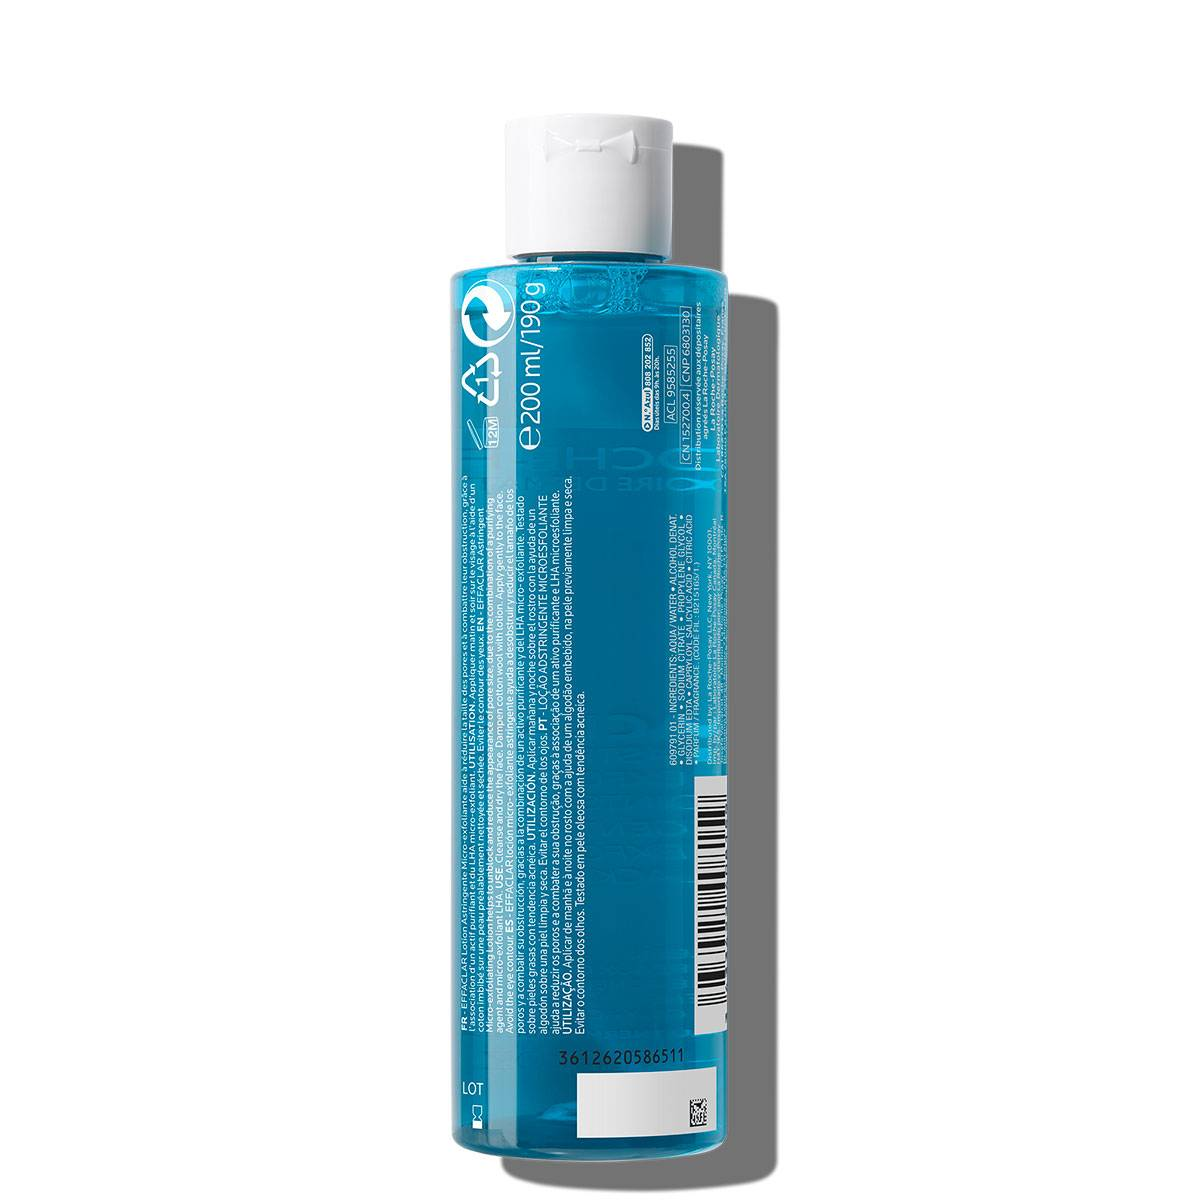 La Roche Posay Ansiktspleie Effaclar Micro Exfoliating Astringent Toner 2